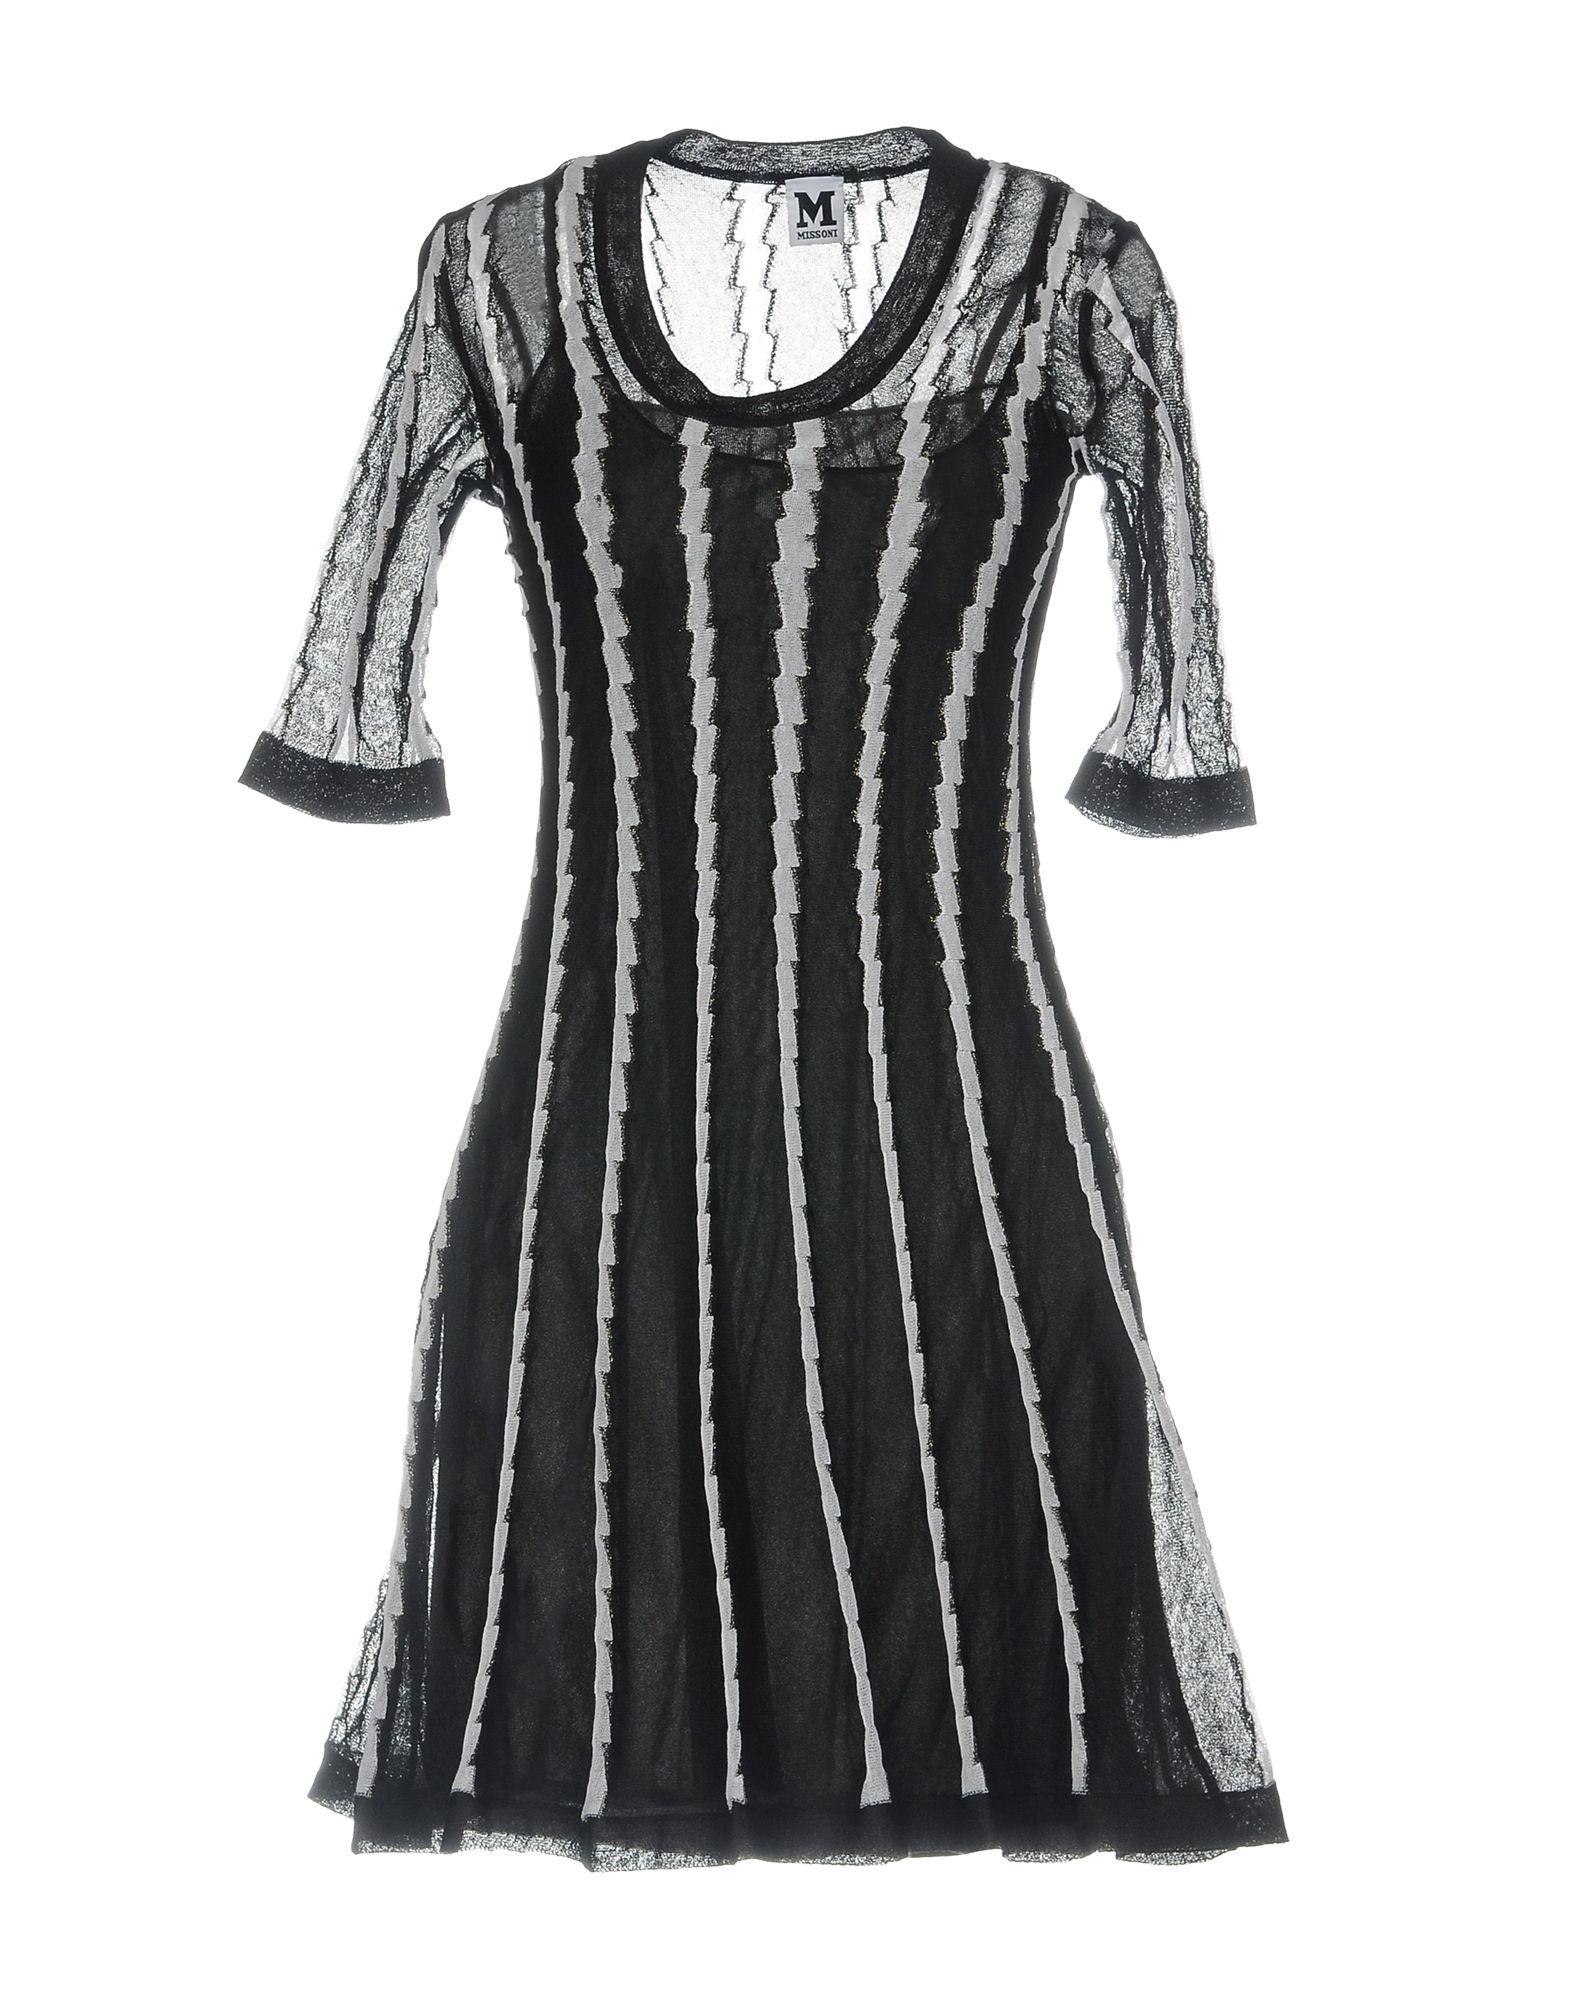 M MISSONI ΦΟΡΕΜΑΤΑ Κοντό φόρεμα